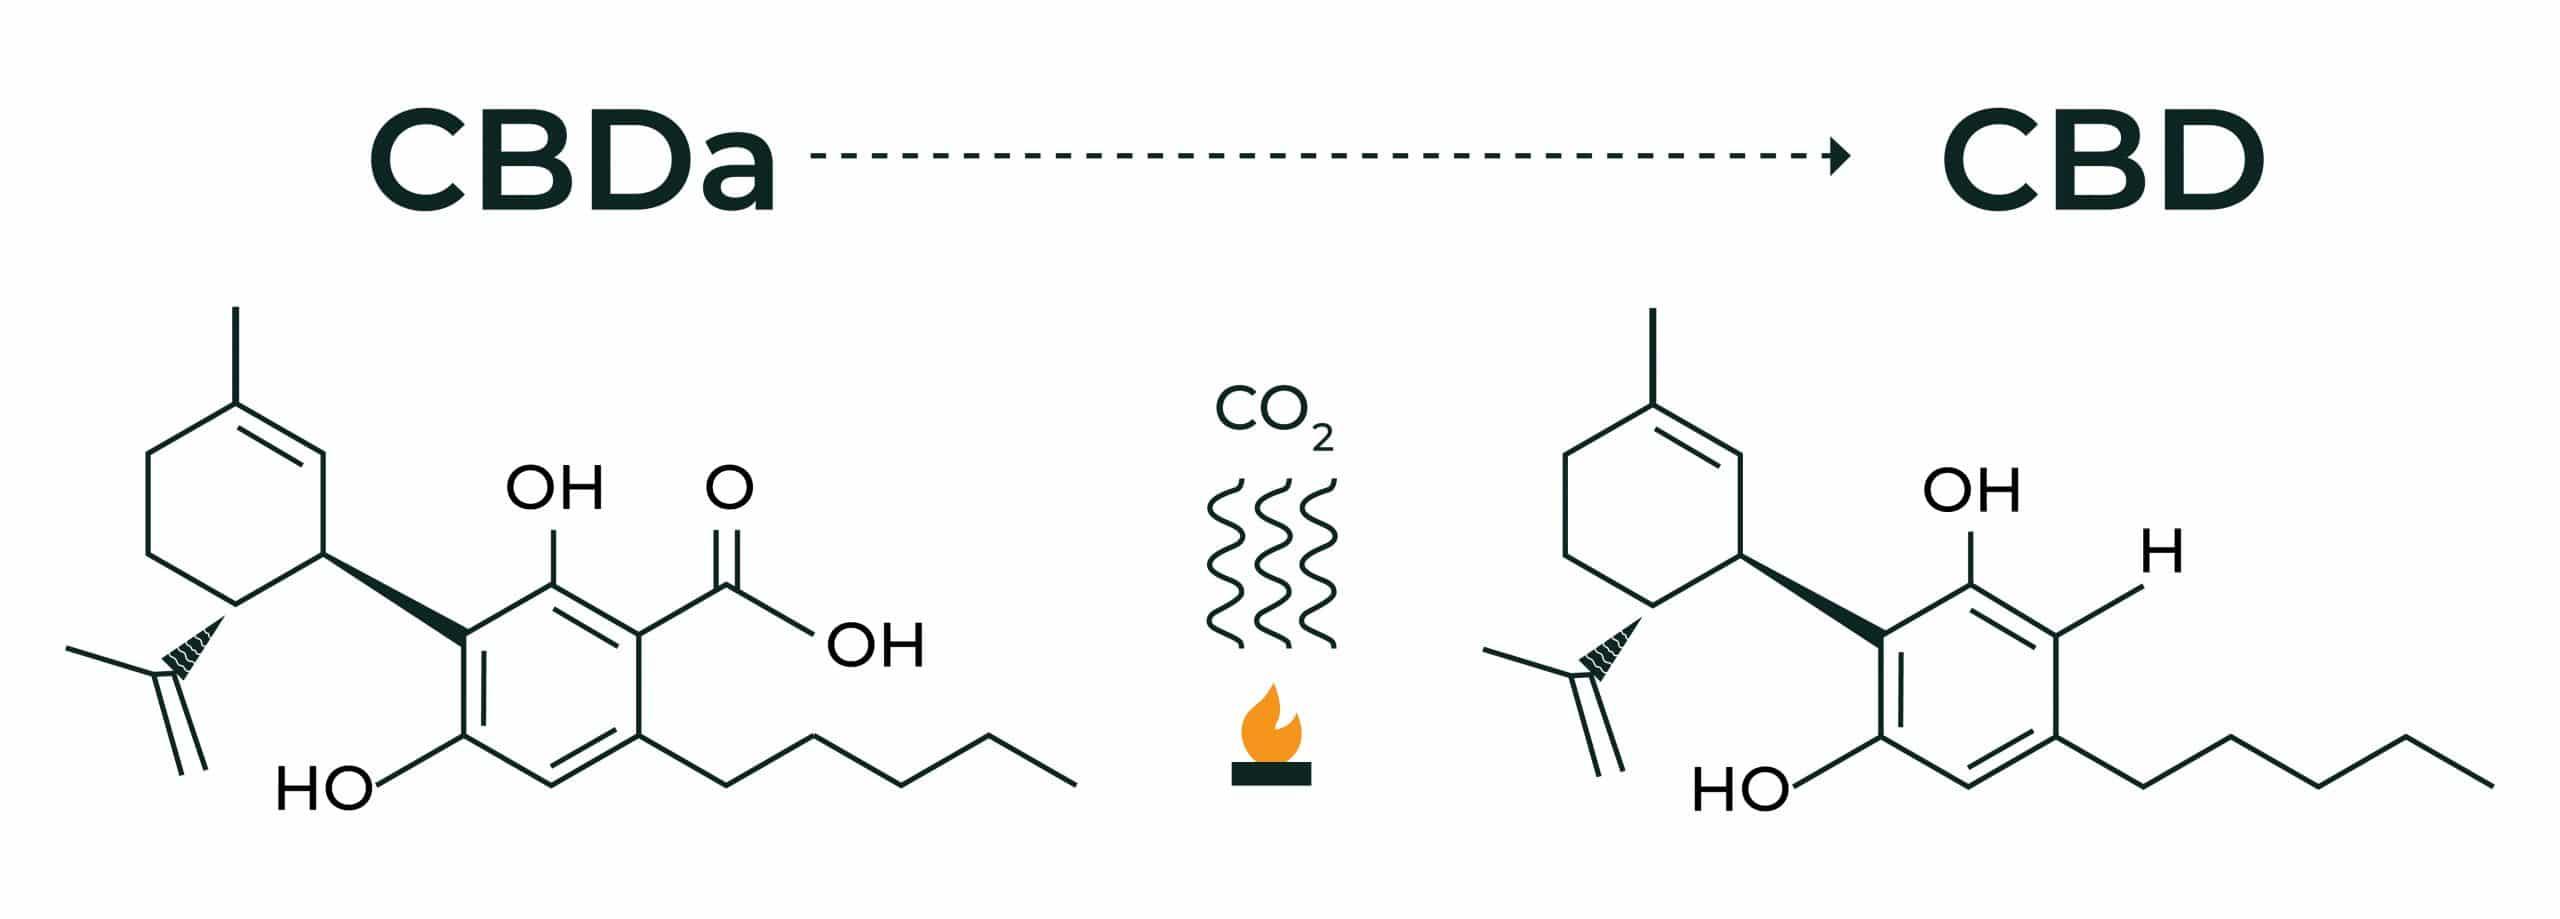 Decarboxylation process of decarbing Cannabidiol (CBD) to change CBDa to CBD